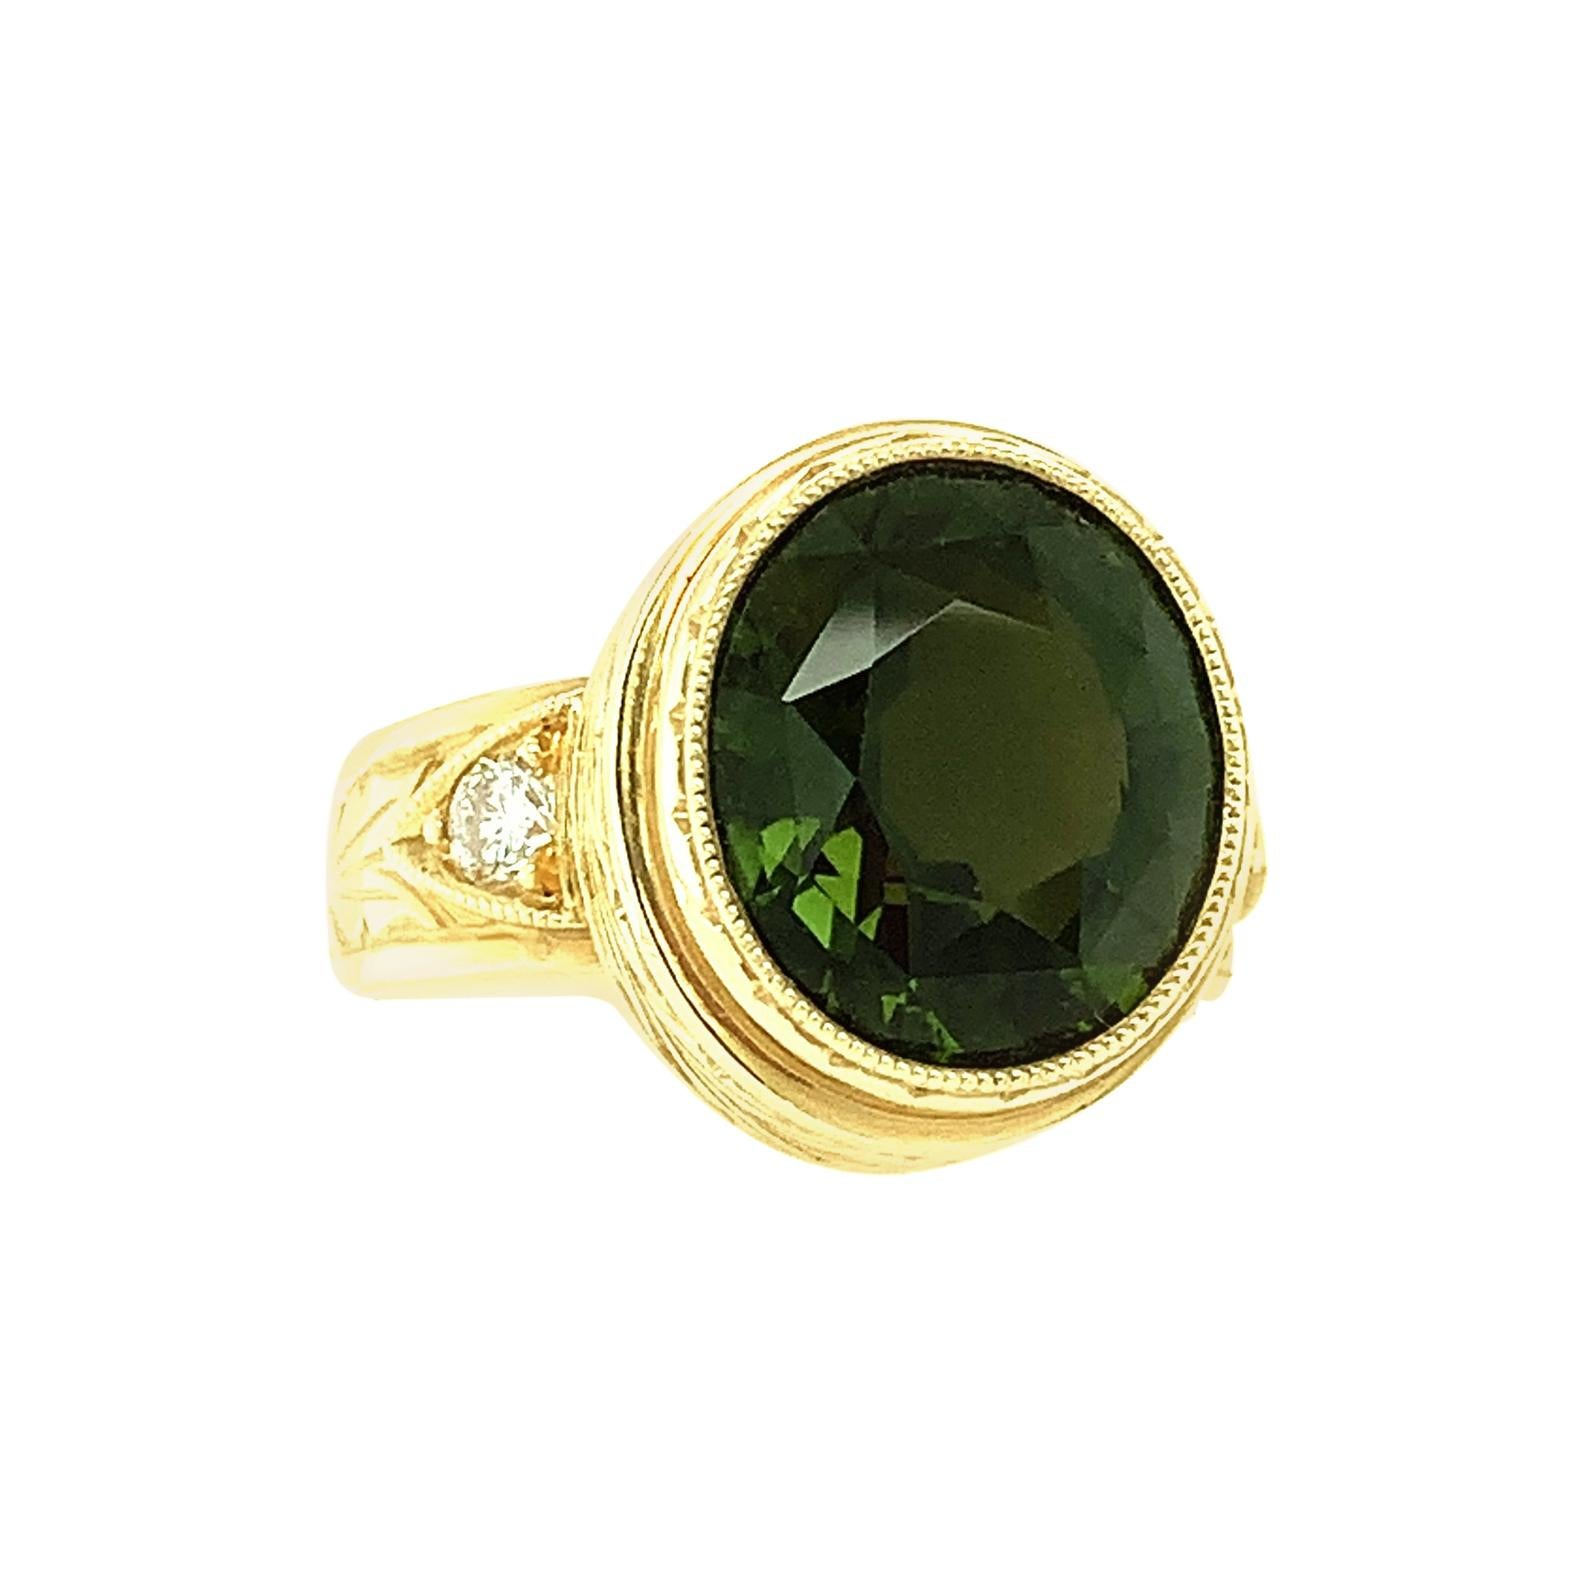 5.20 Carat Green Tourmaline Oval, Diamond and Yellow Gold Bezel Signet Ring